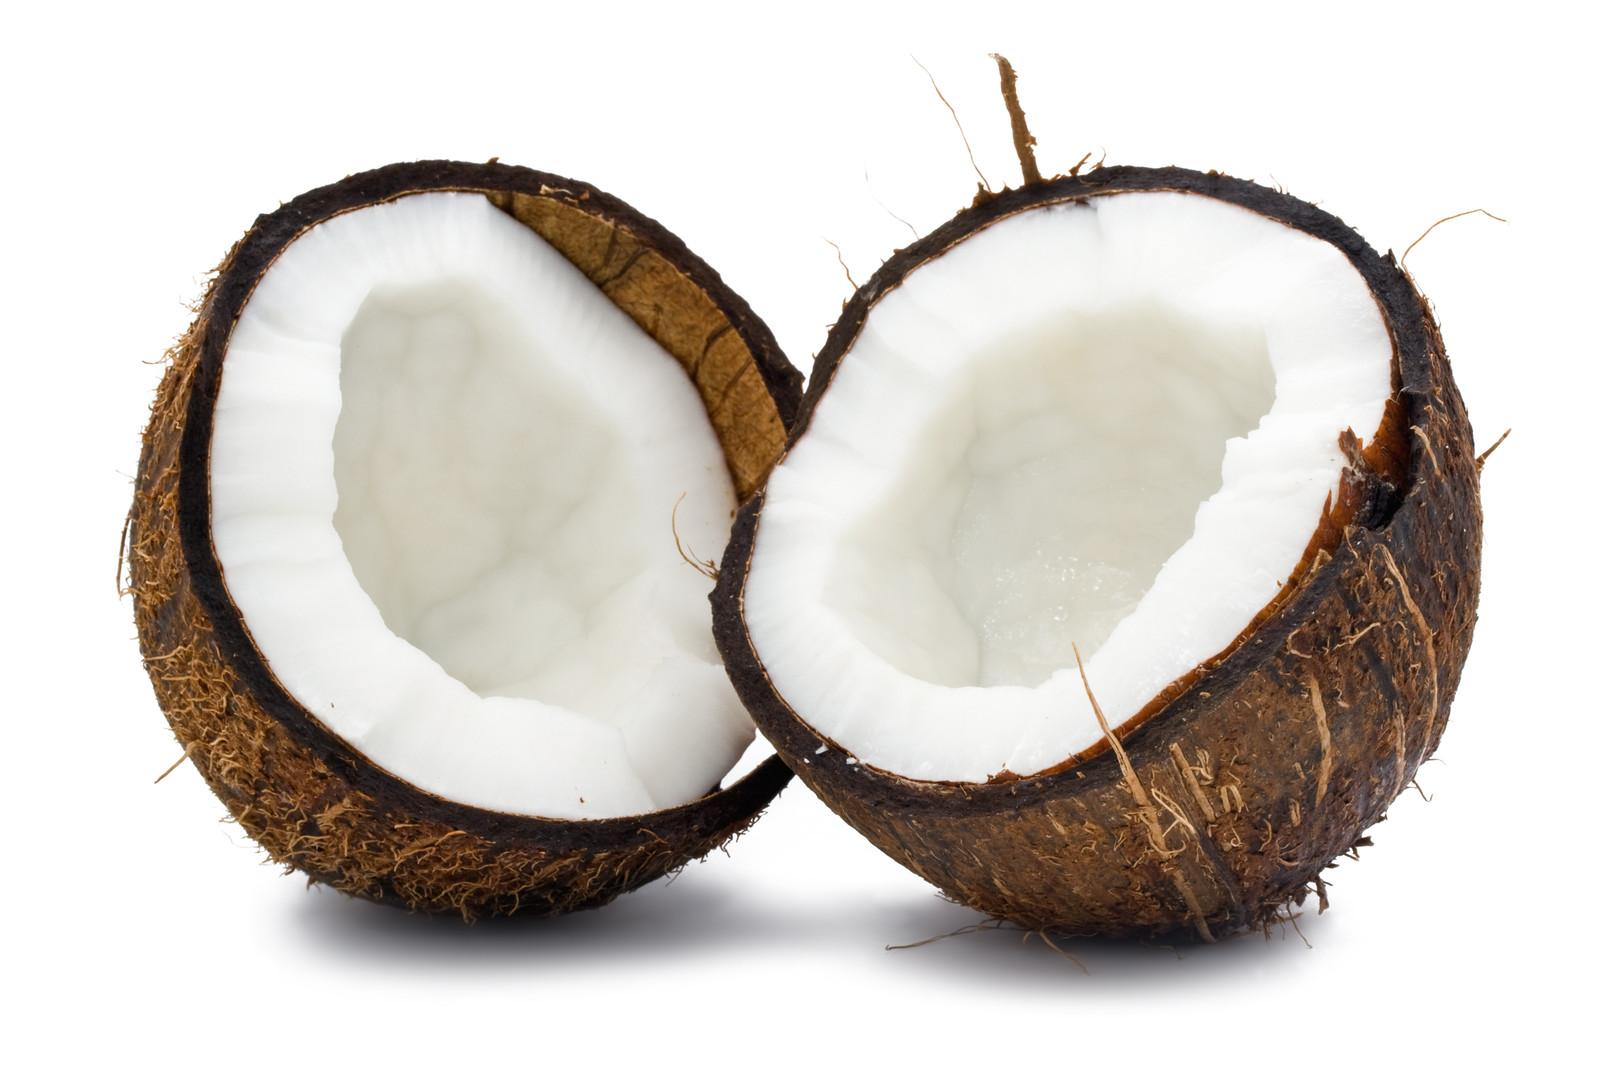 ... coconut bra t shirt grass skirt clip art coconut clip art please